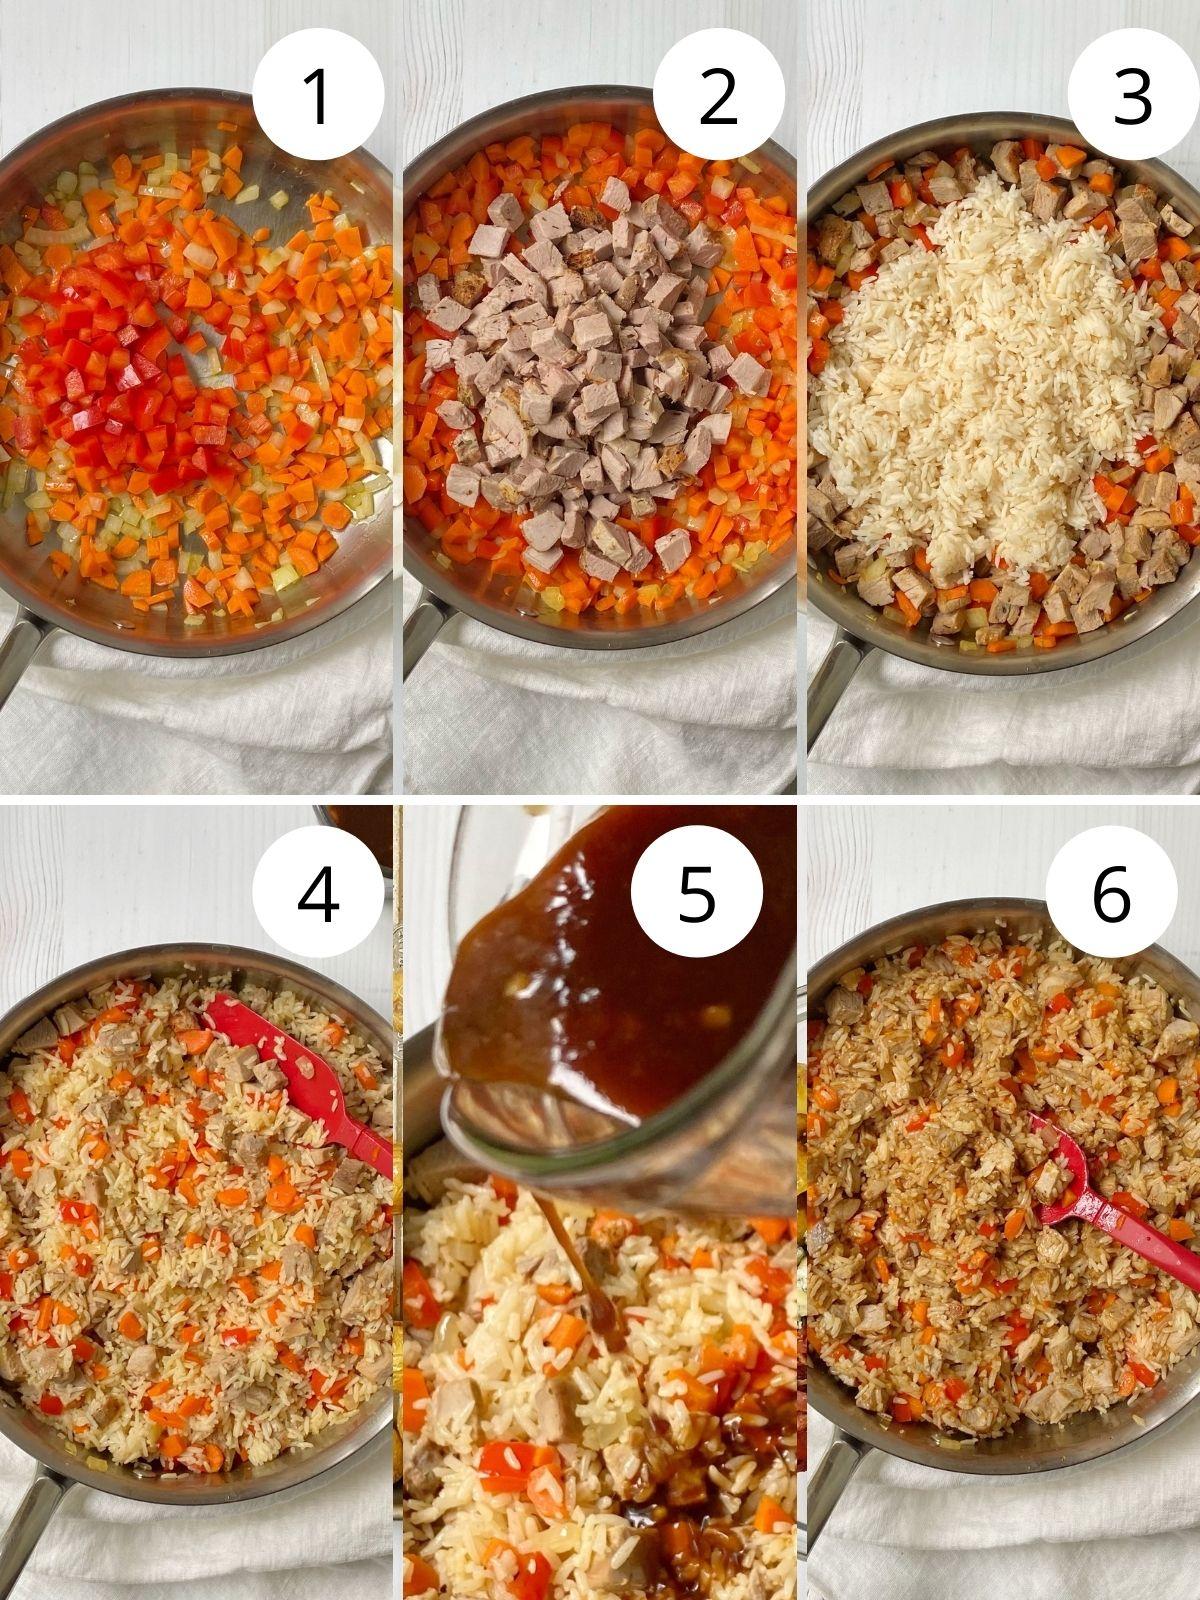 pork fried rice process